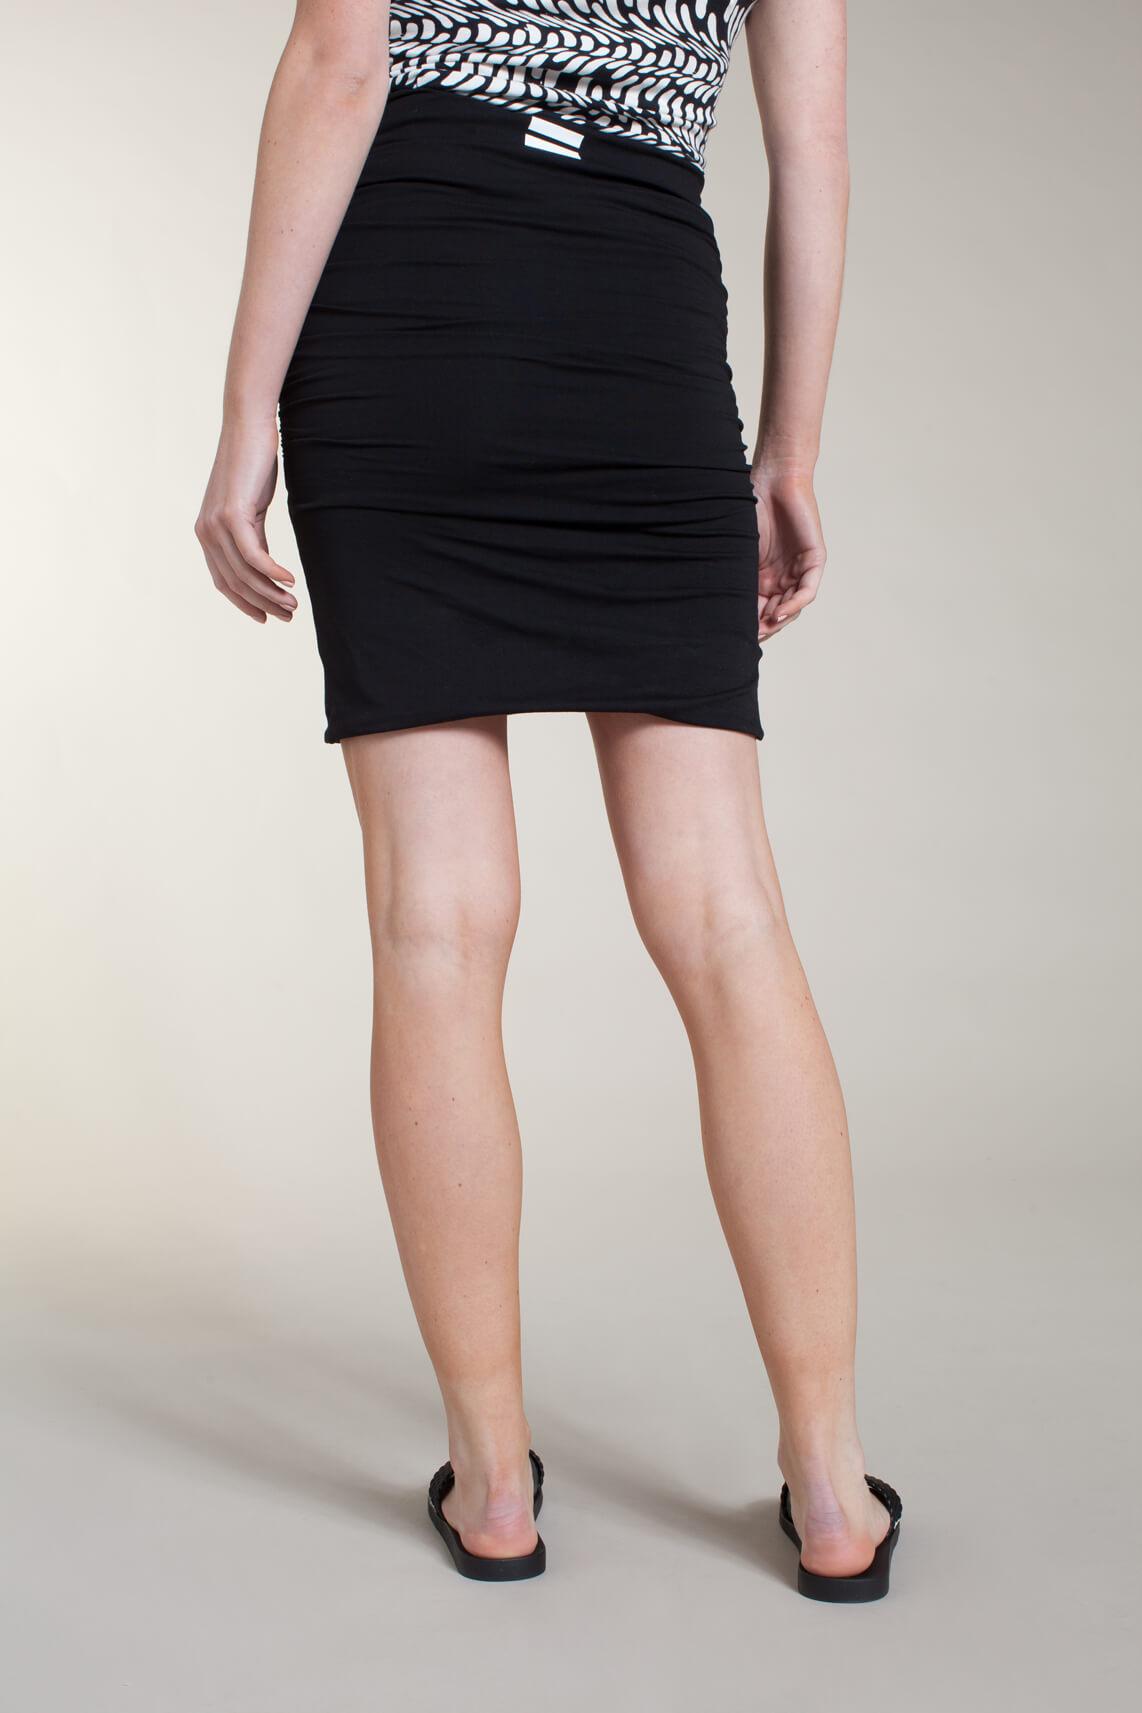 10 Days Dames Mini rok zwart